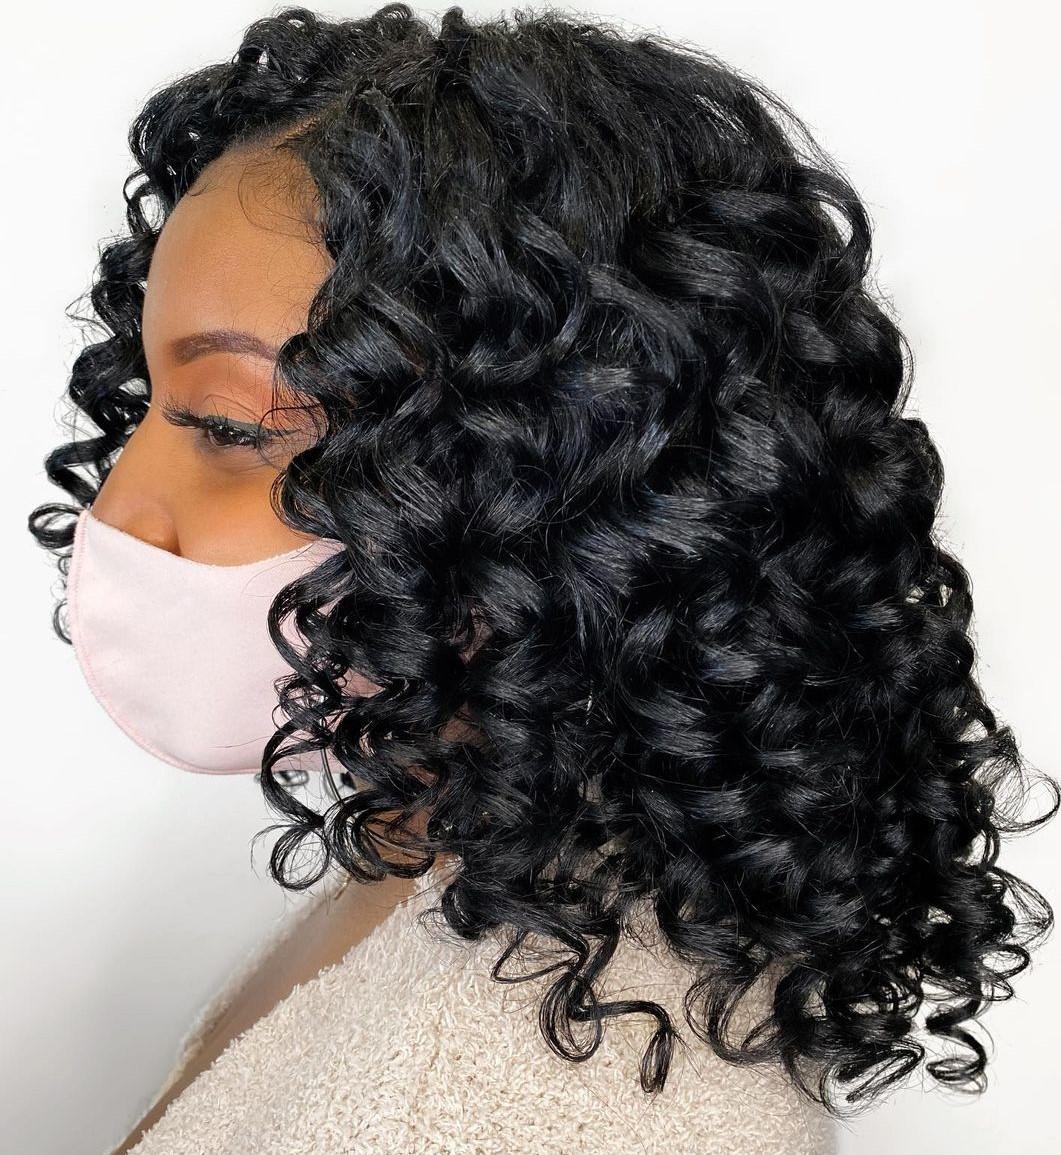 Black Deva Cut for Defined Curls